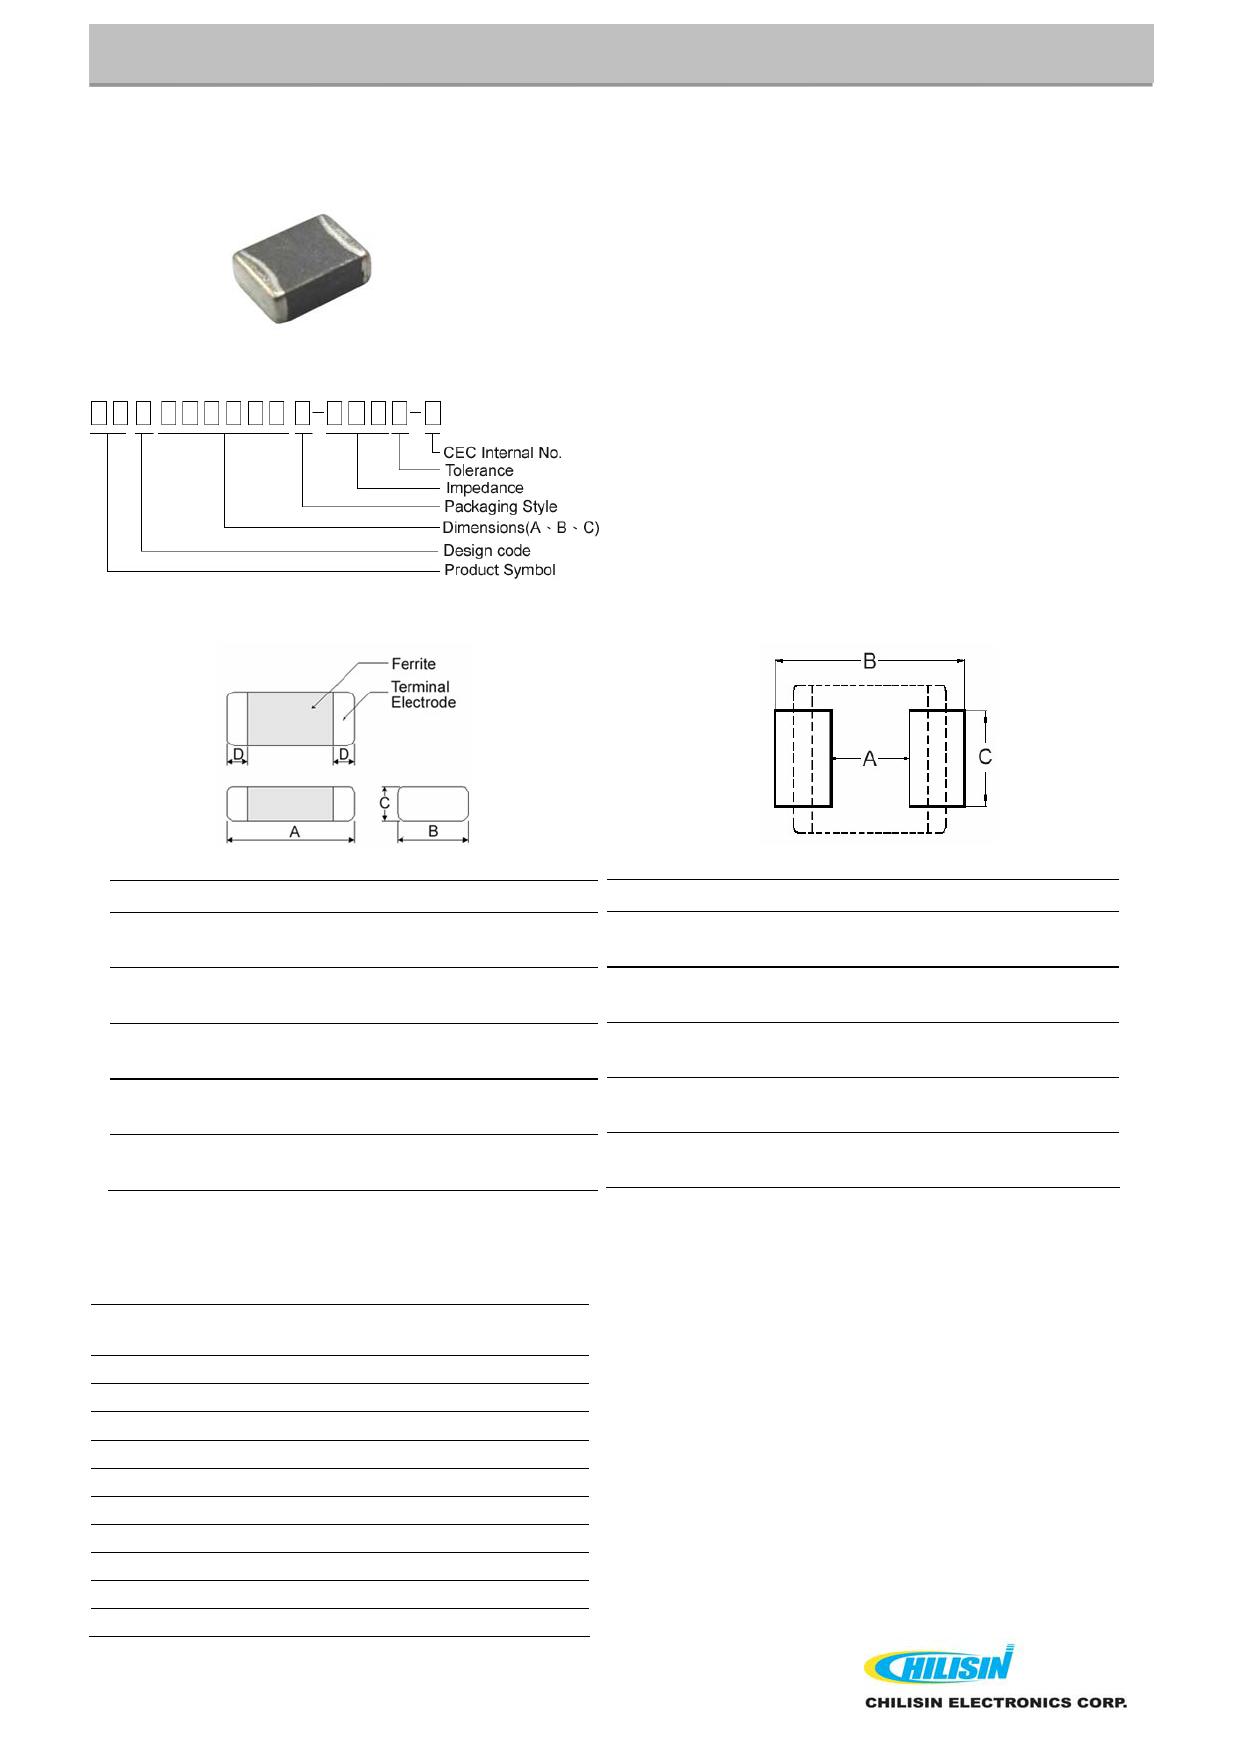 GBK160808T 데이터시트 및 GBK160808T PDF